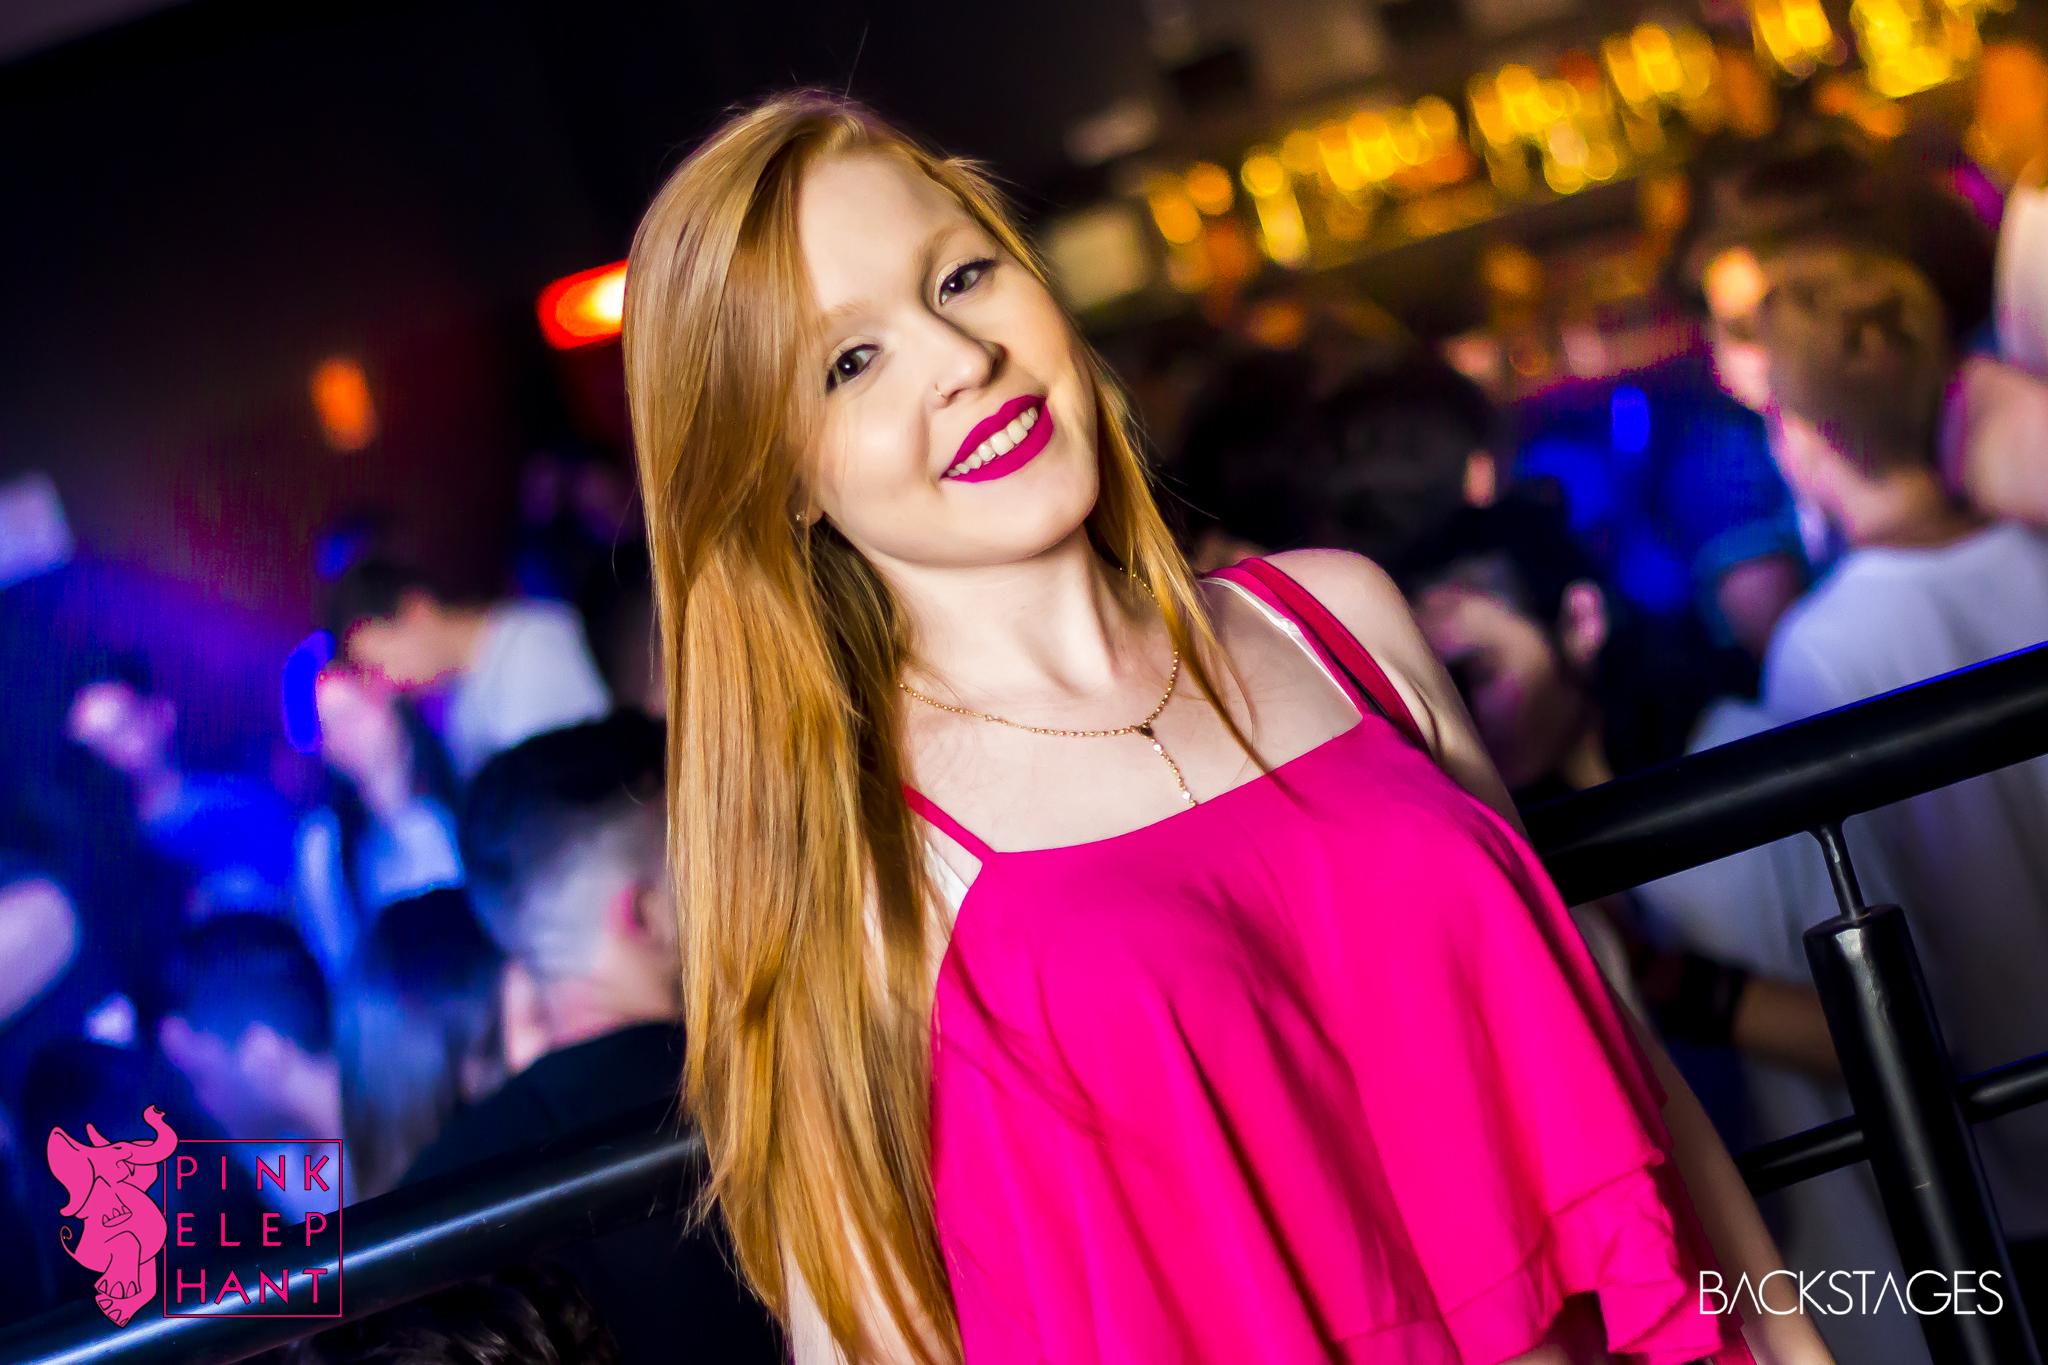 Pink-elephant-club-sorocaba-revista-backstages-foto-kenzi-marinho (1)